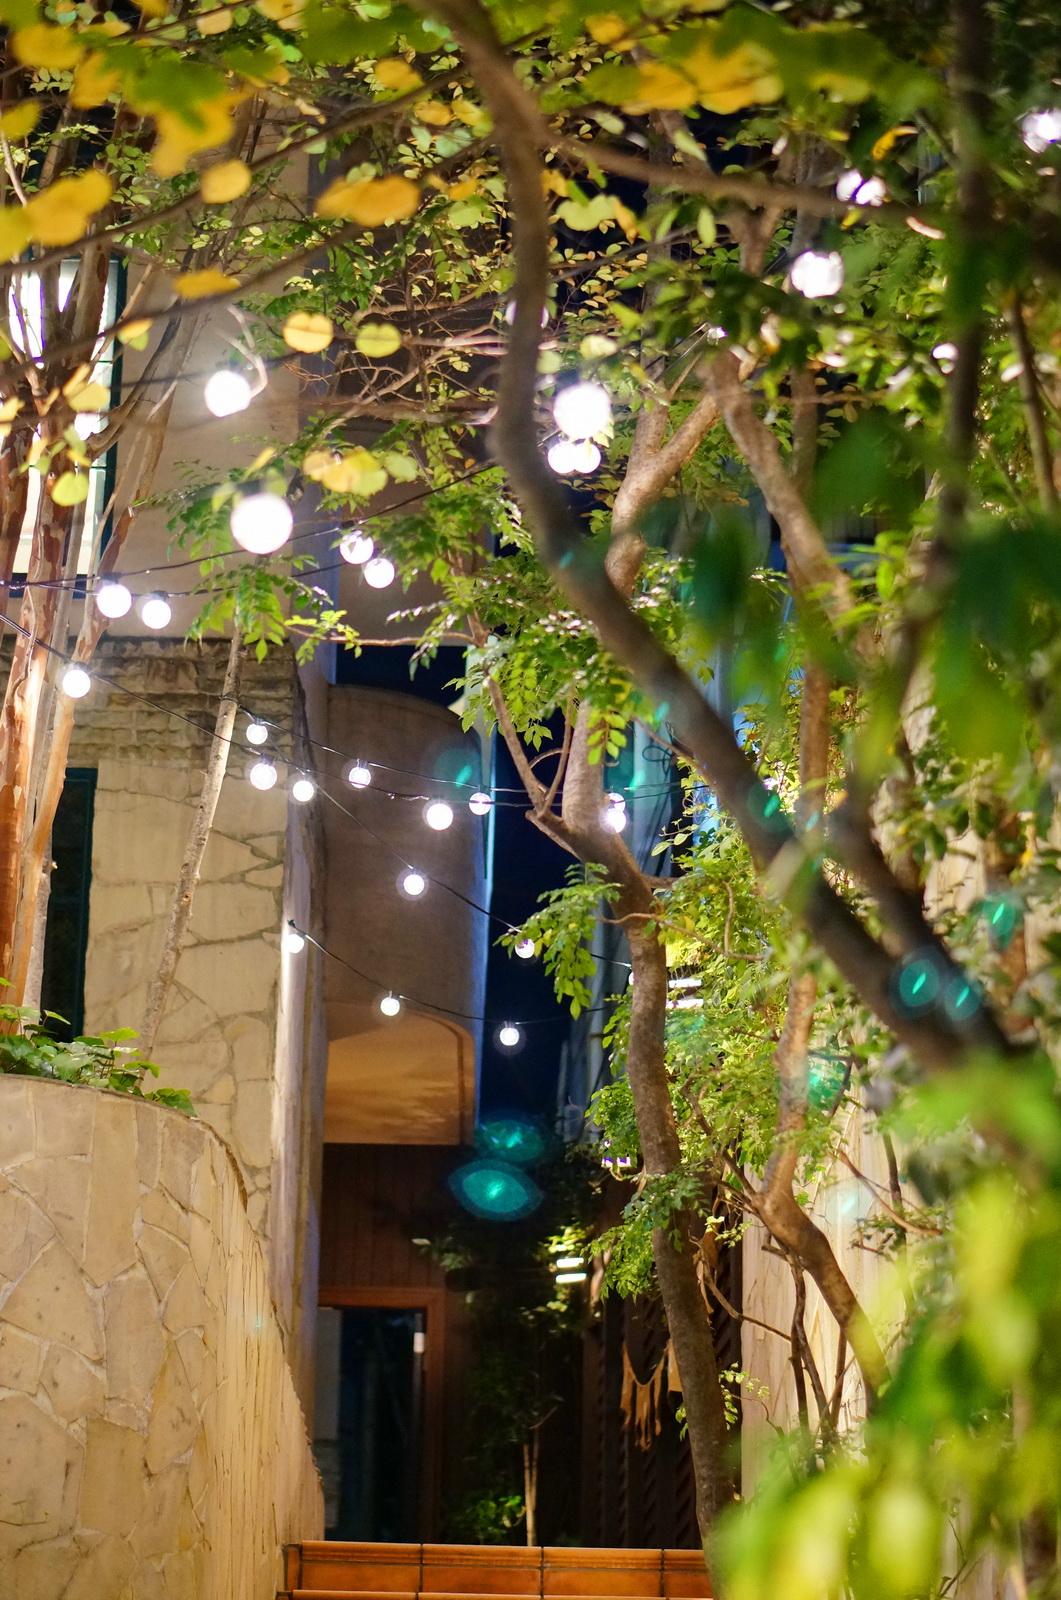 shibuya, tokyo by night, tokyo nuit, cat's street